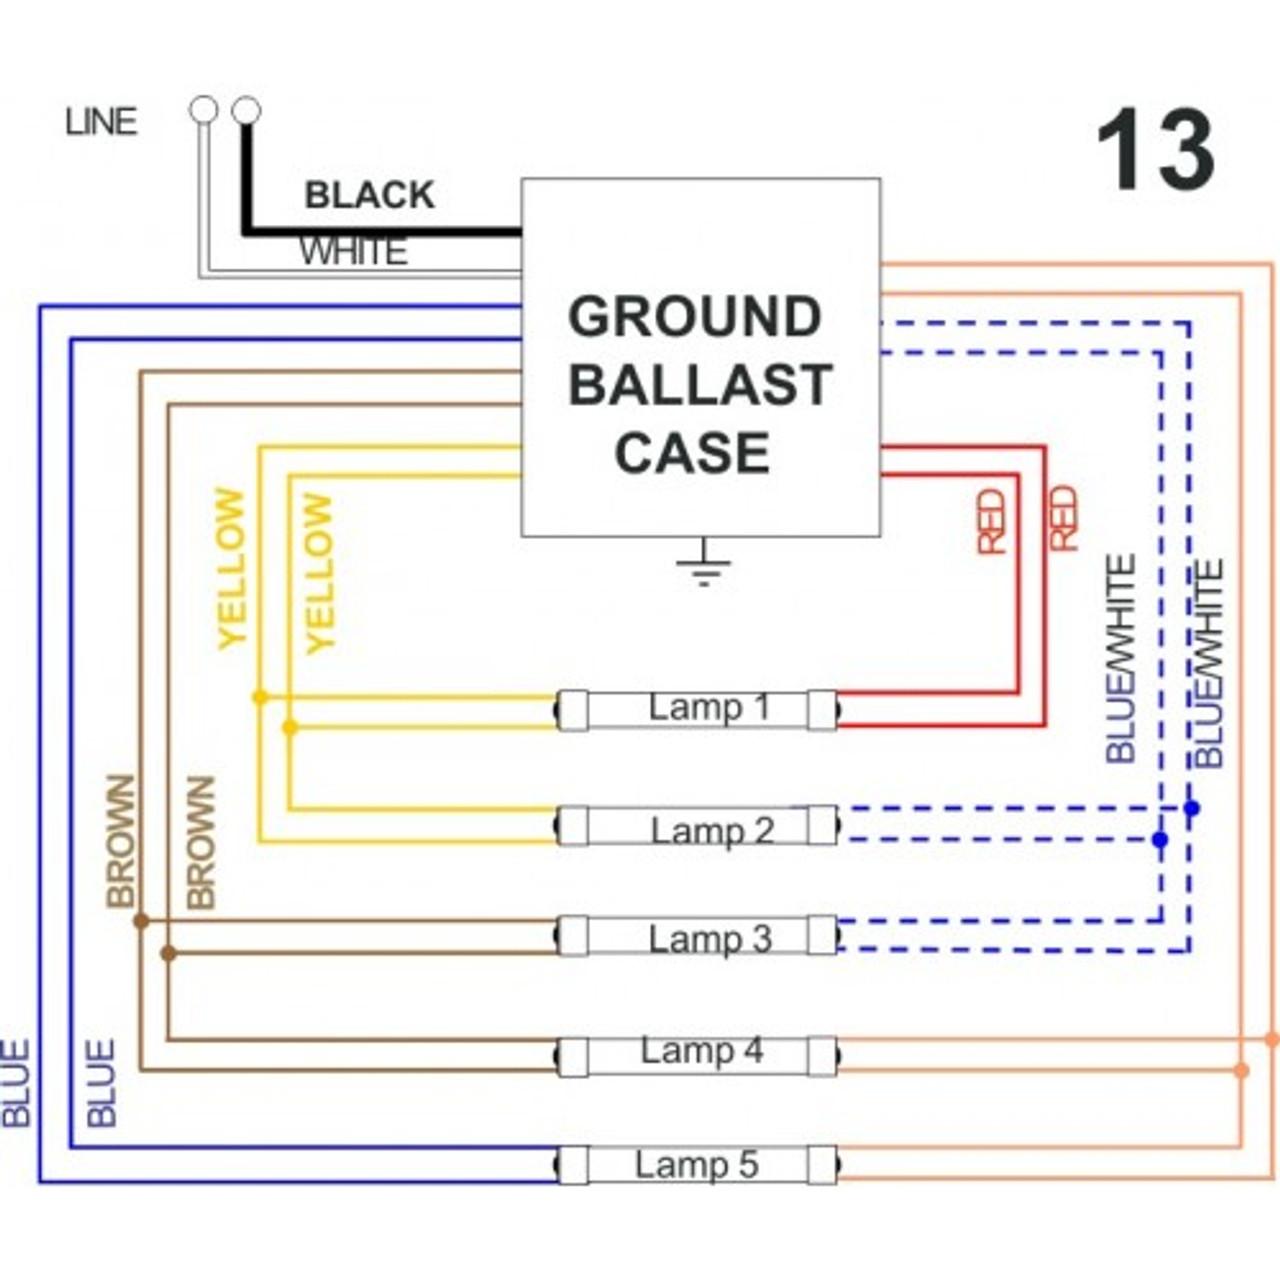 572 at allanson magnetic sign ballast Homans' Sign Diagram